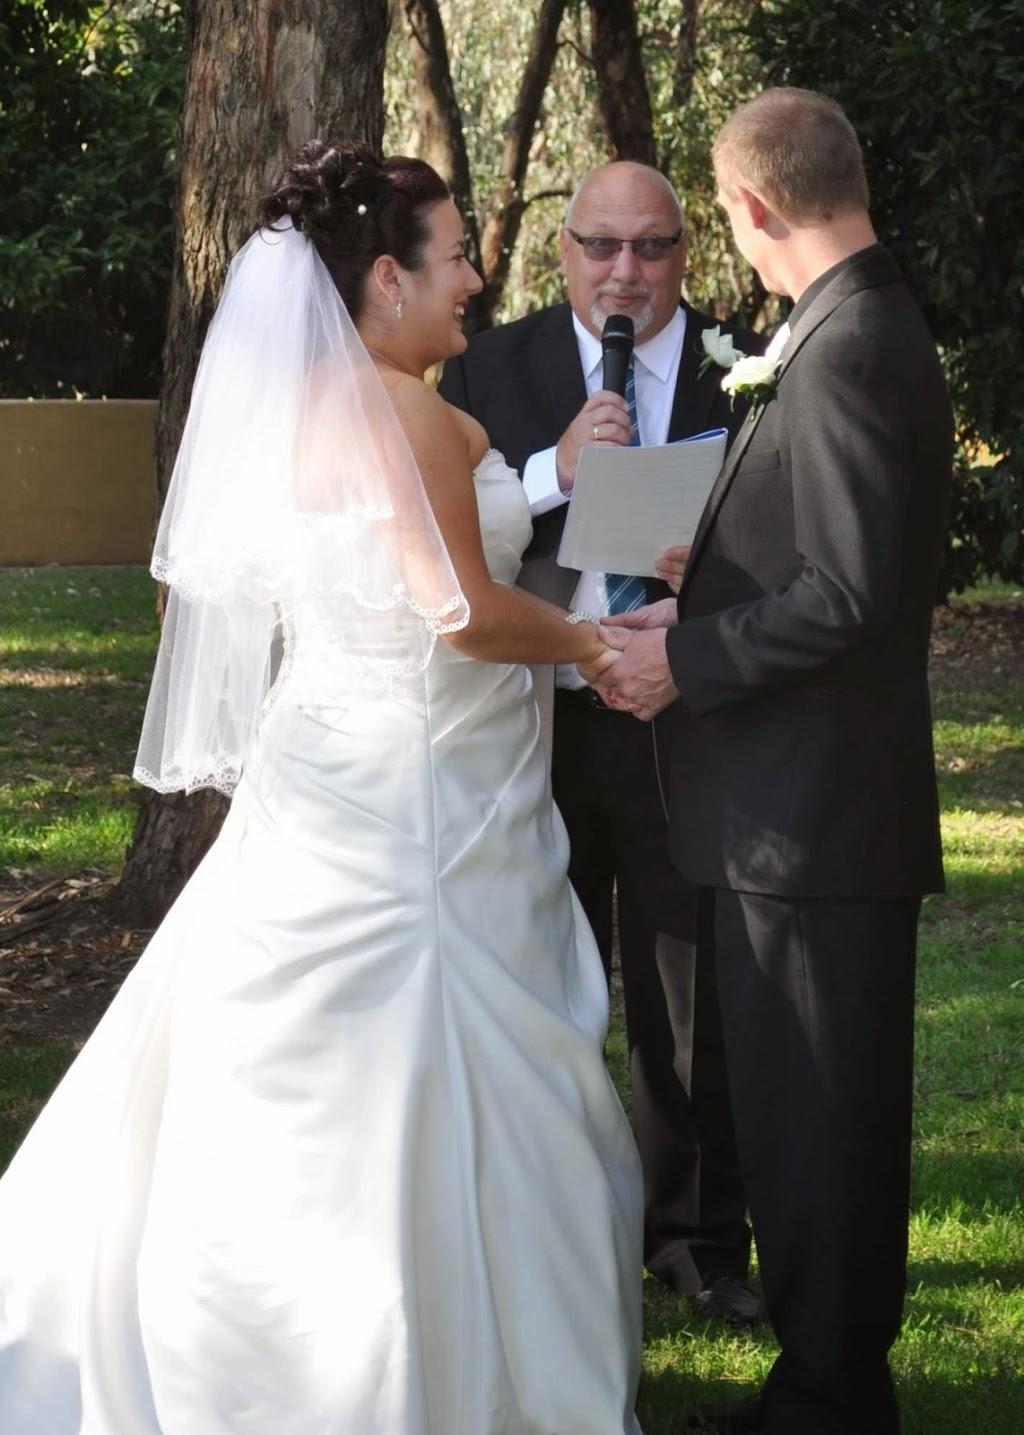 Riverina Celebrant Services   courthouse   337 Parkland Cres, Lavington NSW 2641, Australia   0412767227 OR +61 412 767 227